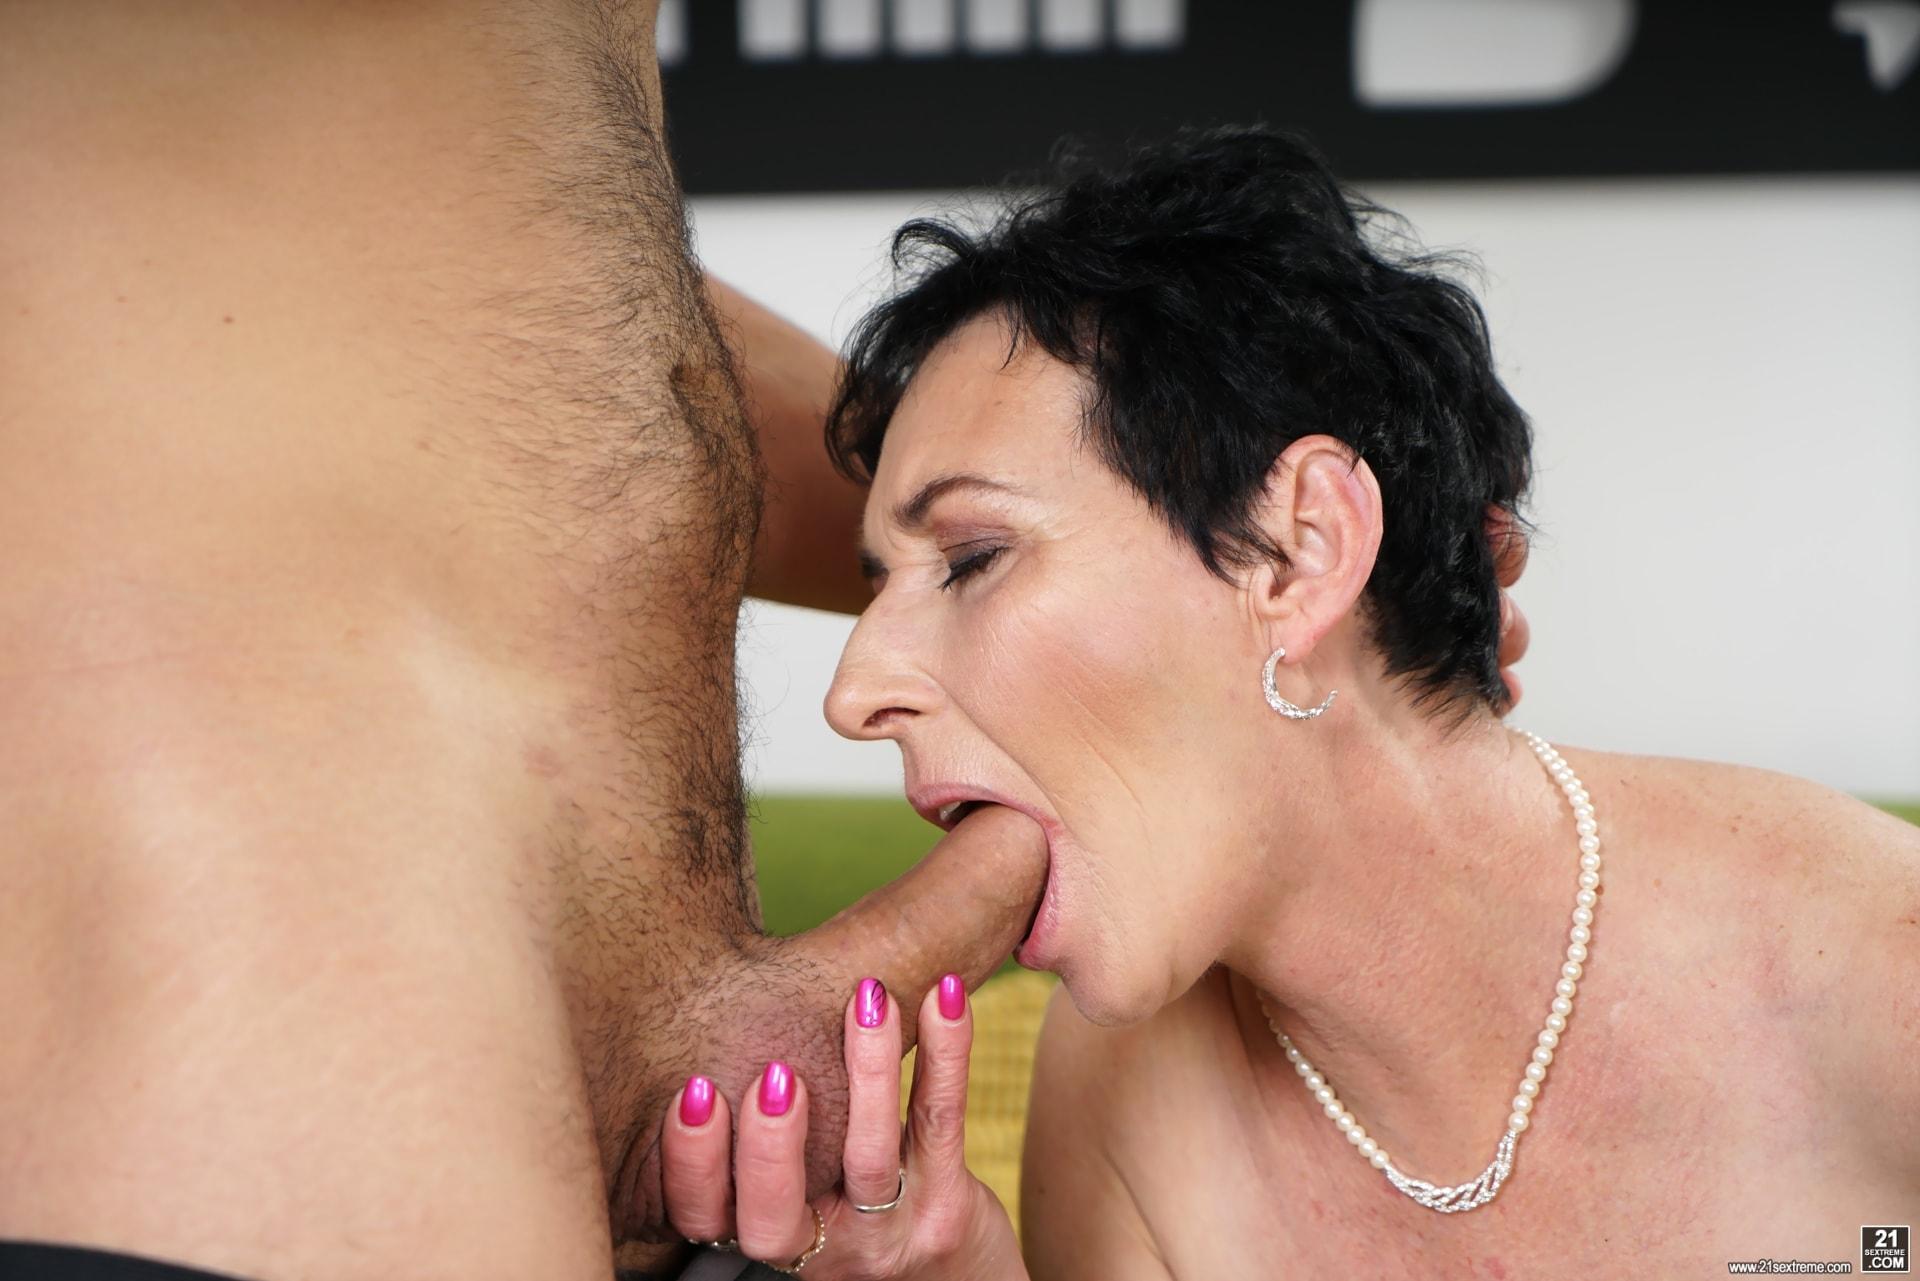 21Sextury 'Lust For Pixie' starring Pixie (Photo 112)